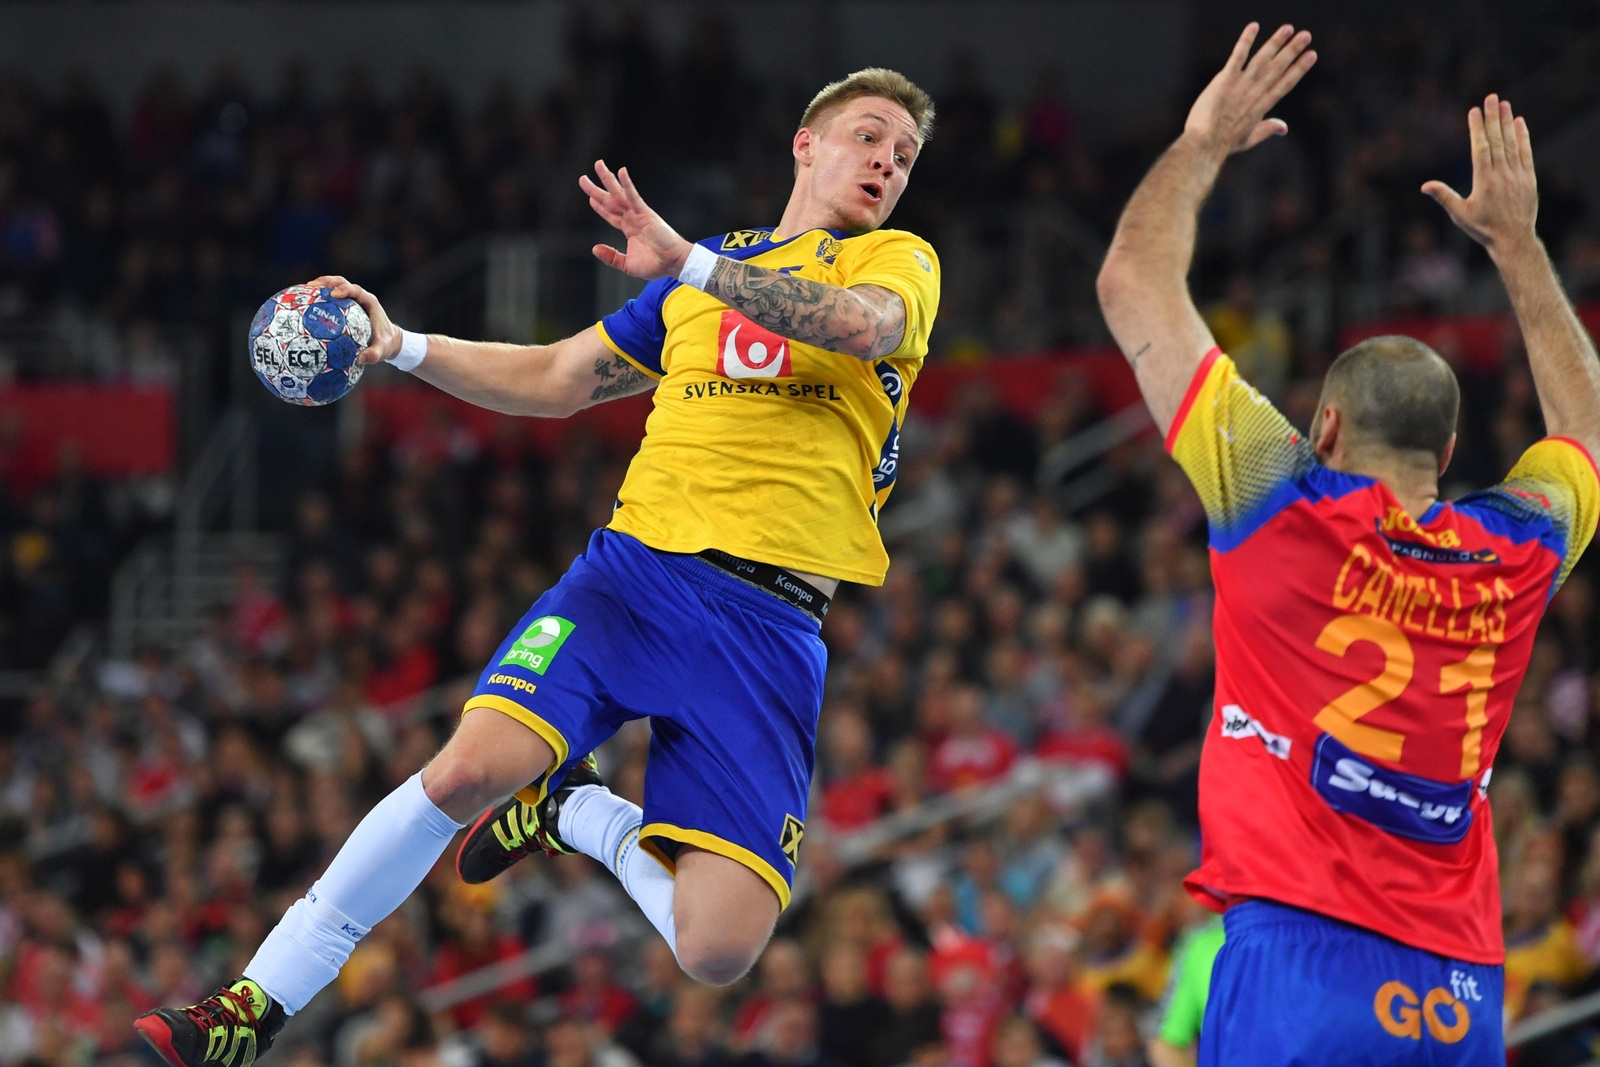 Schwedische Handball Liga